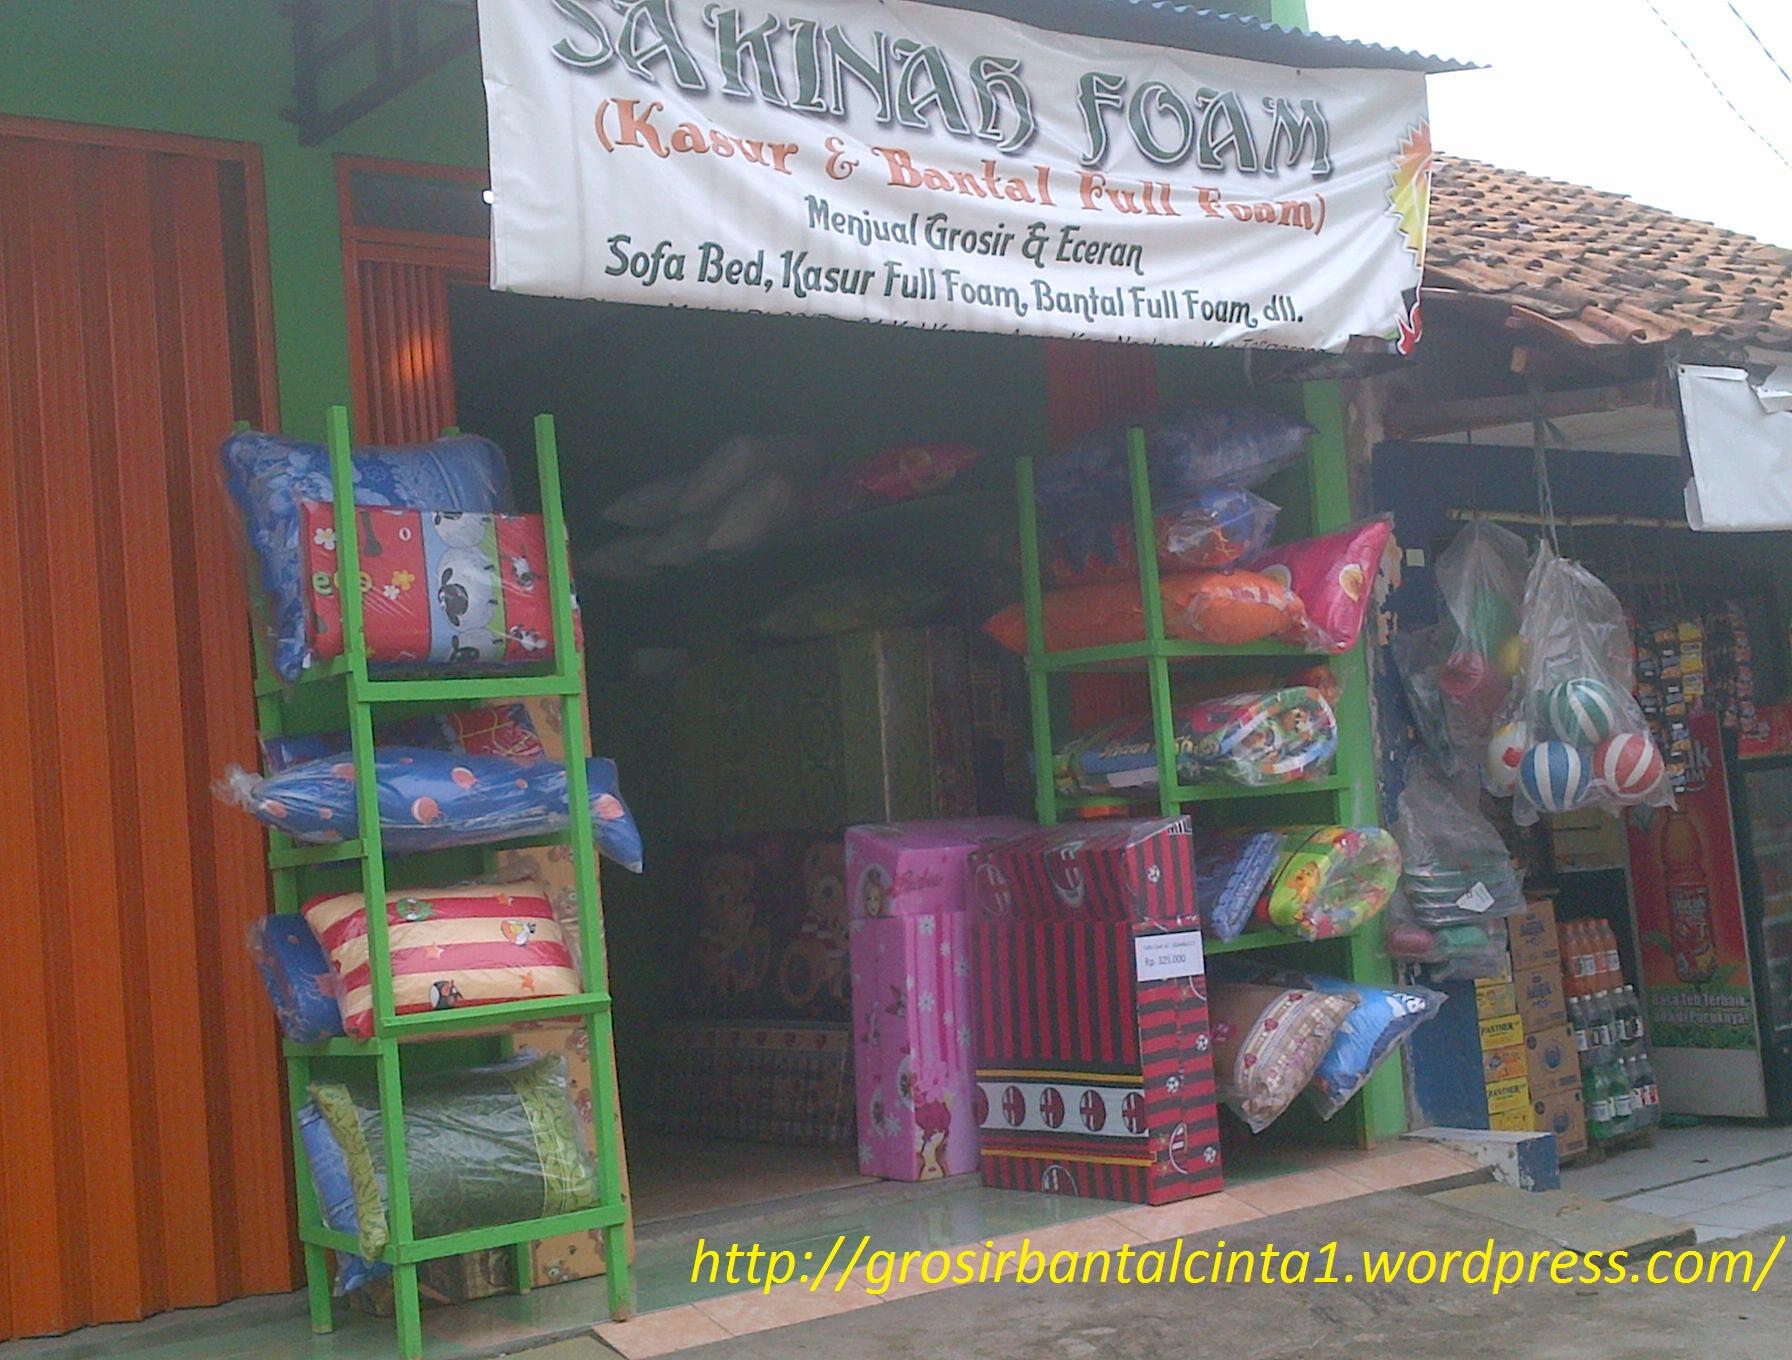 sofa bed kasur busa lipat inoac jakarta rooms to go furniture sleeper jual murah